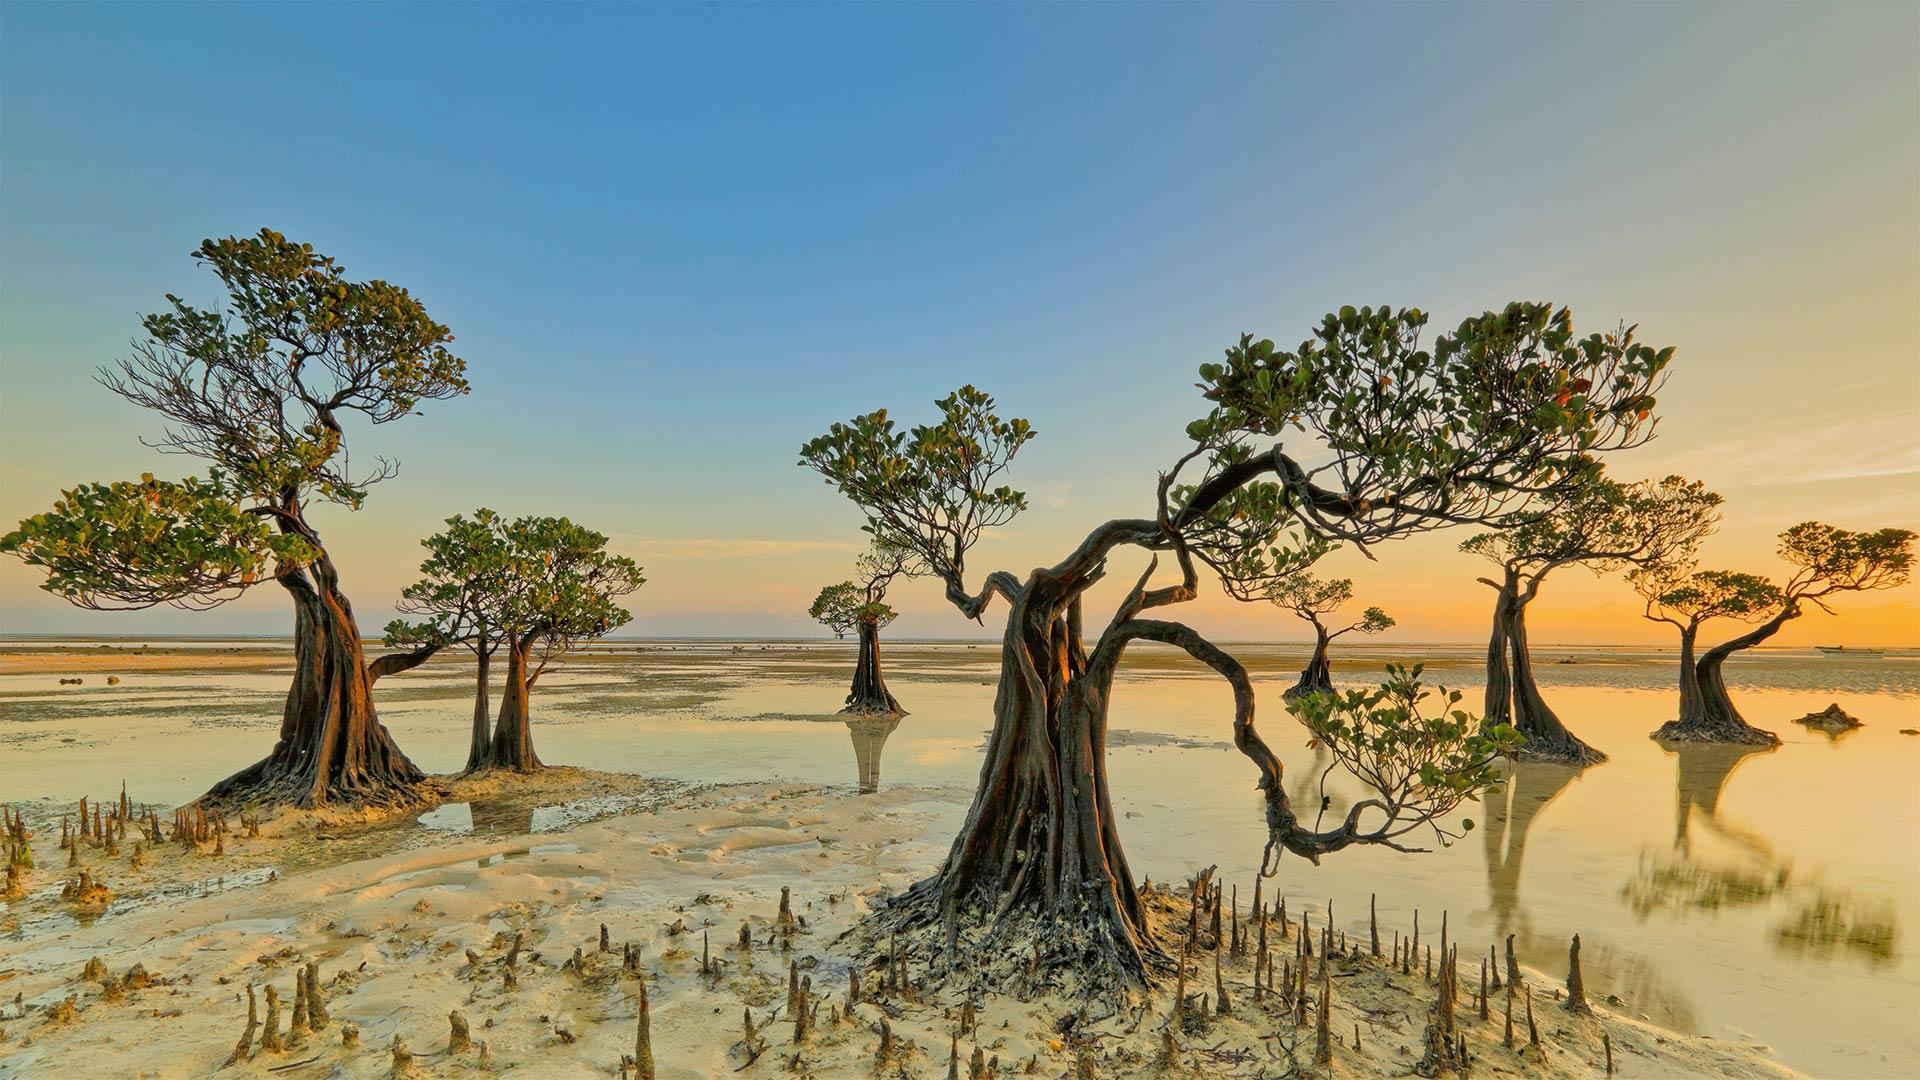 Mangrove trees, Walakiri Beach, Sumba Island, Indonesia (© Tengguo Wu/Getty Images)(Bing United States)